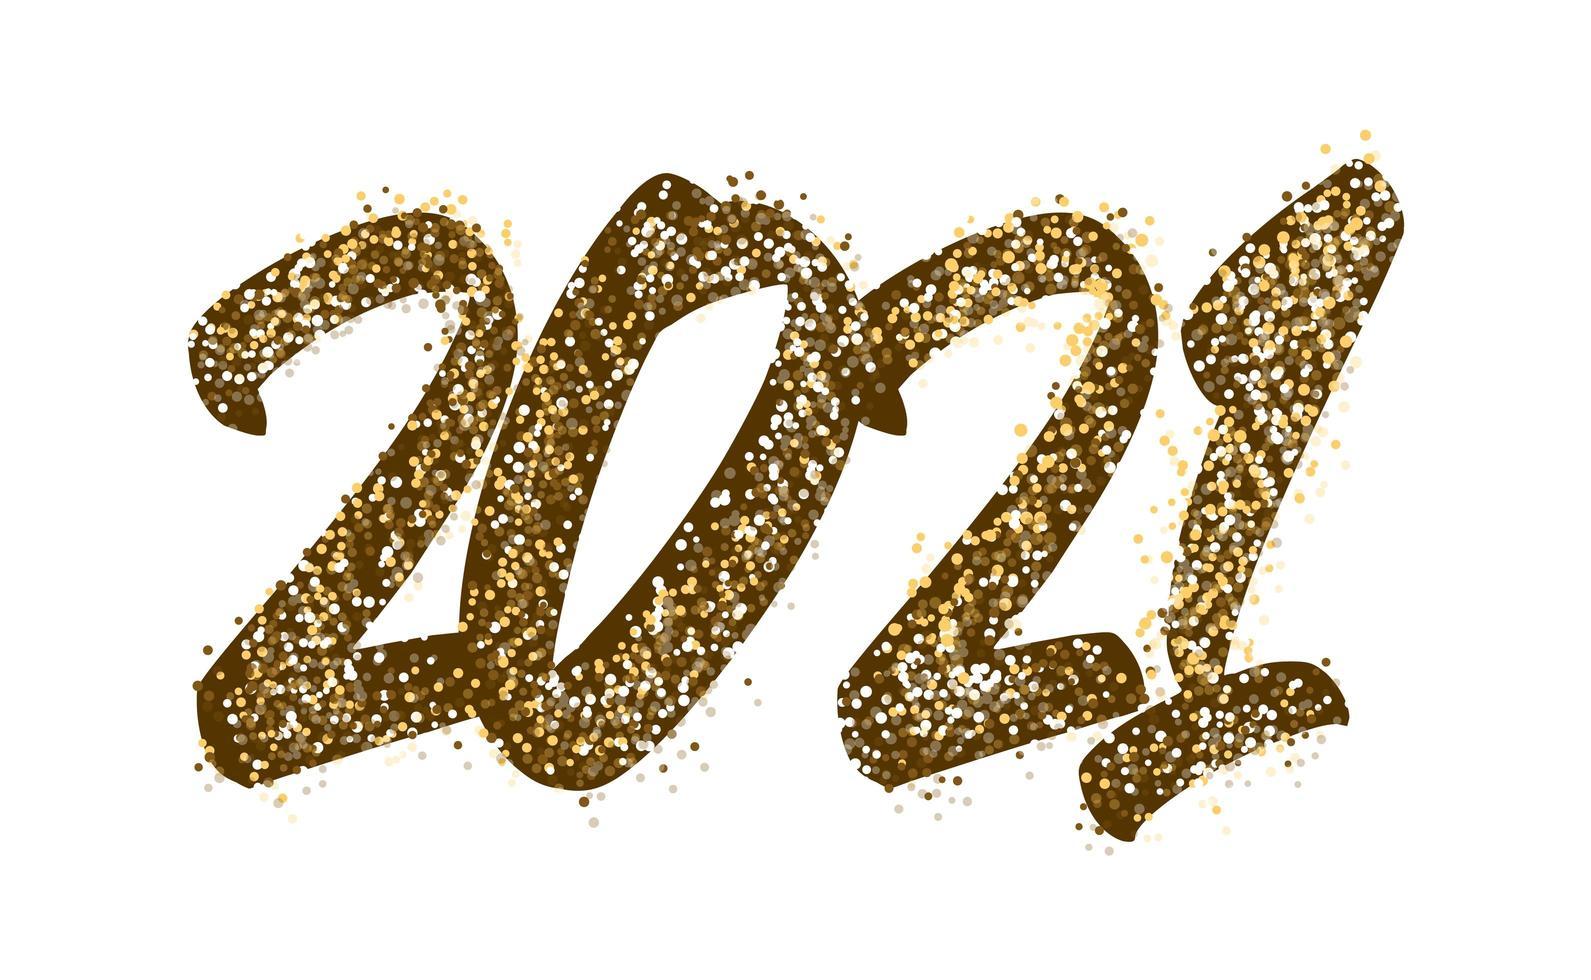 2021 gyllene gnistrande typografi vektor